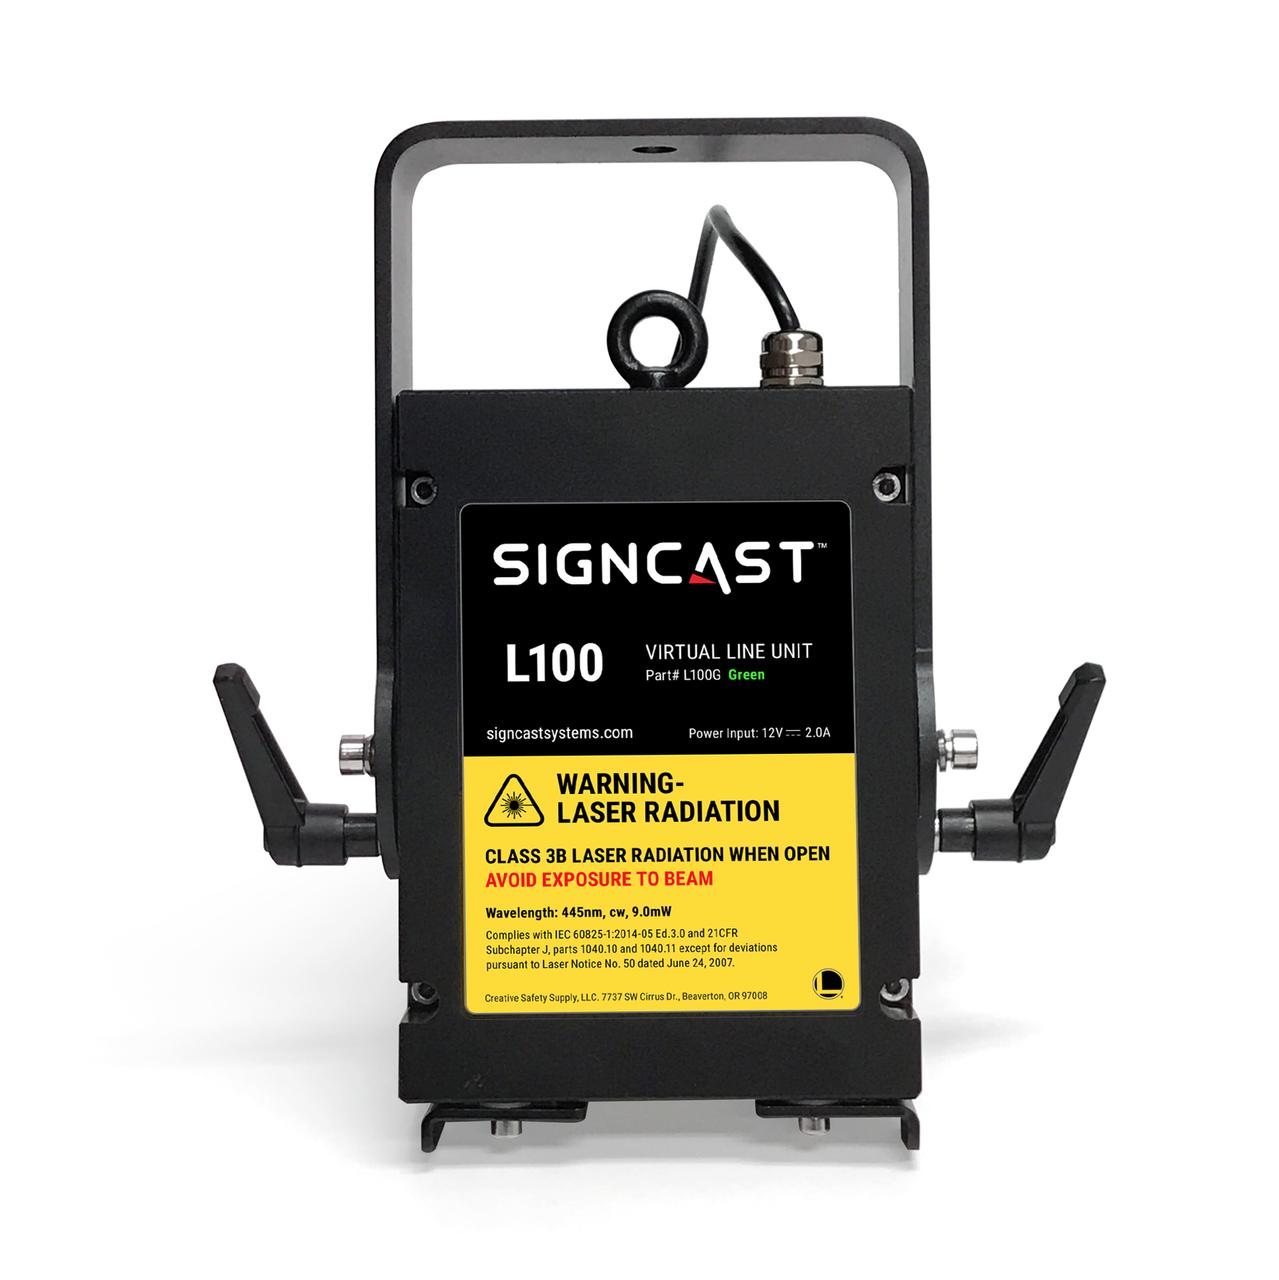 signcast l100 virtual line unit rh creativesafetysupply com